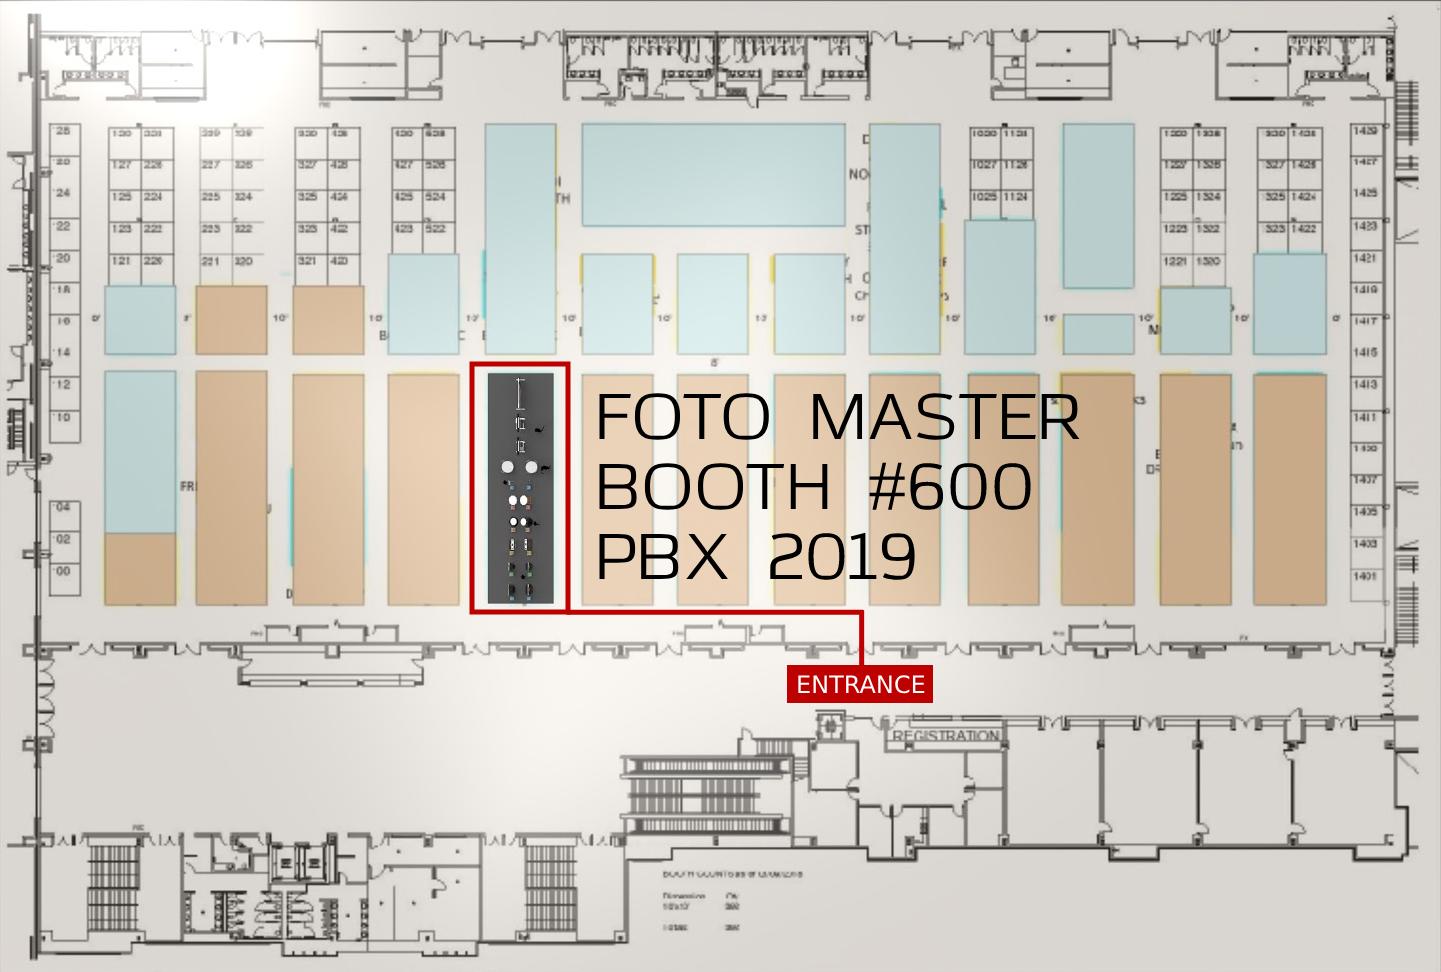 PBX 2019: Foto Master, Booth 600